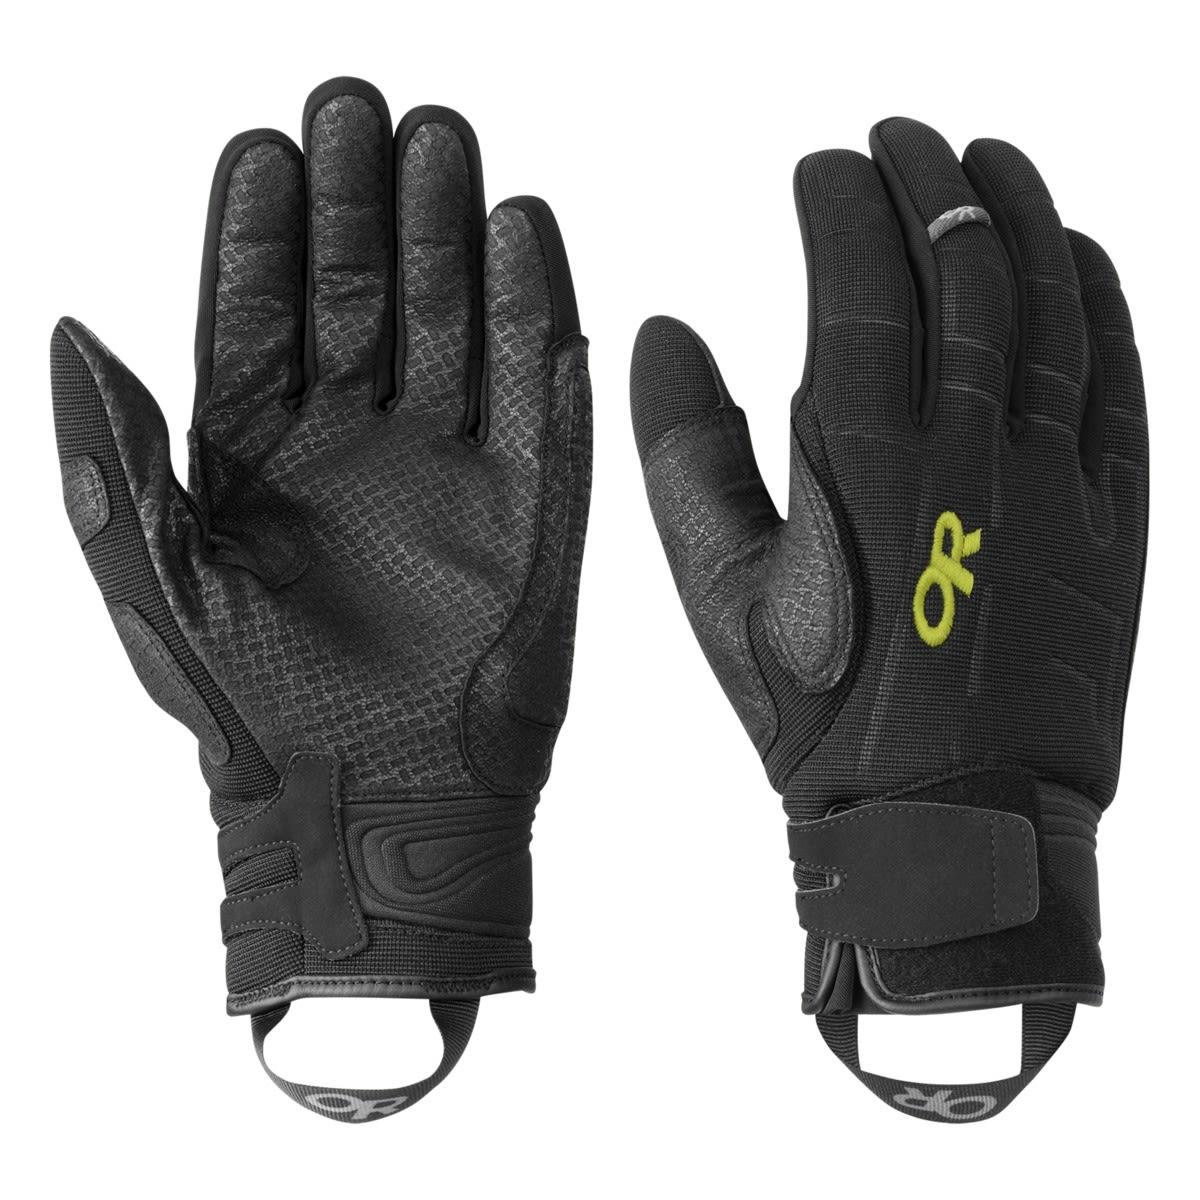 Outdoor Research Alibi II Gloves Schwarz, Accessoires, M